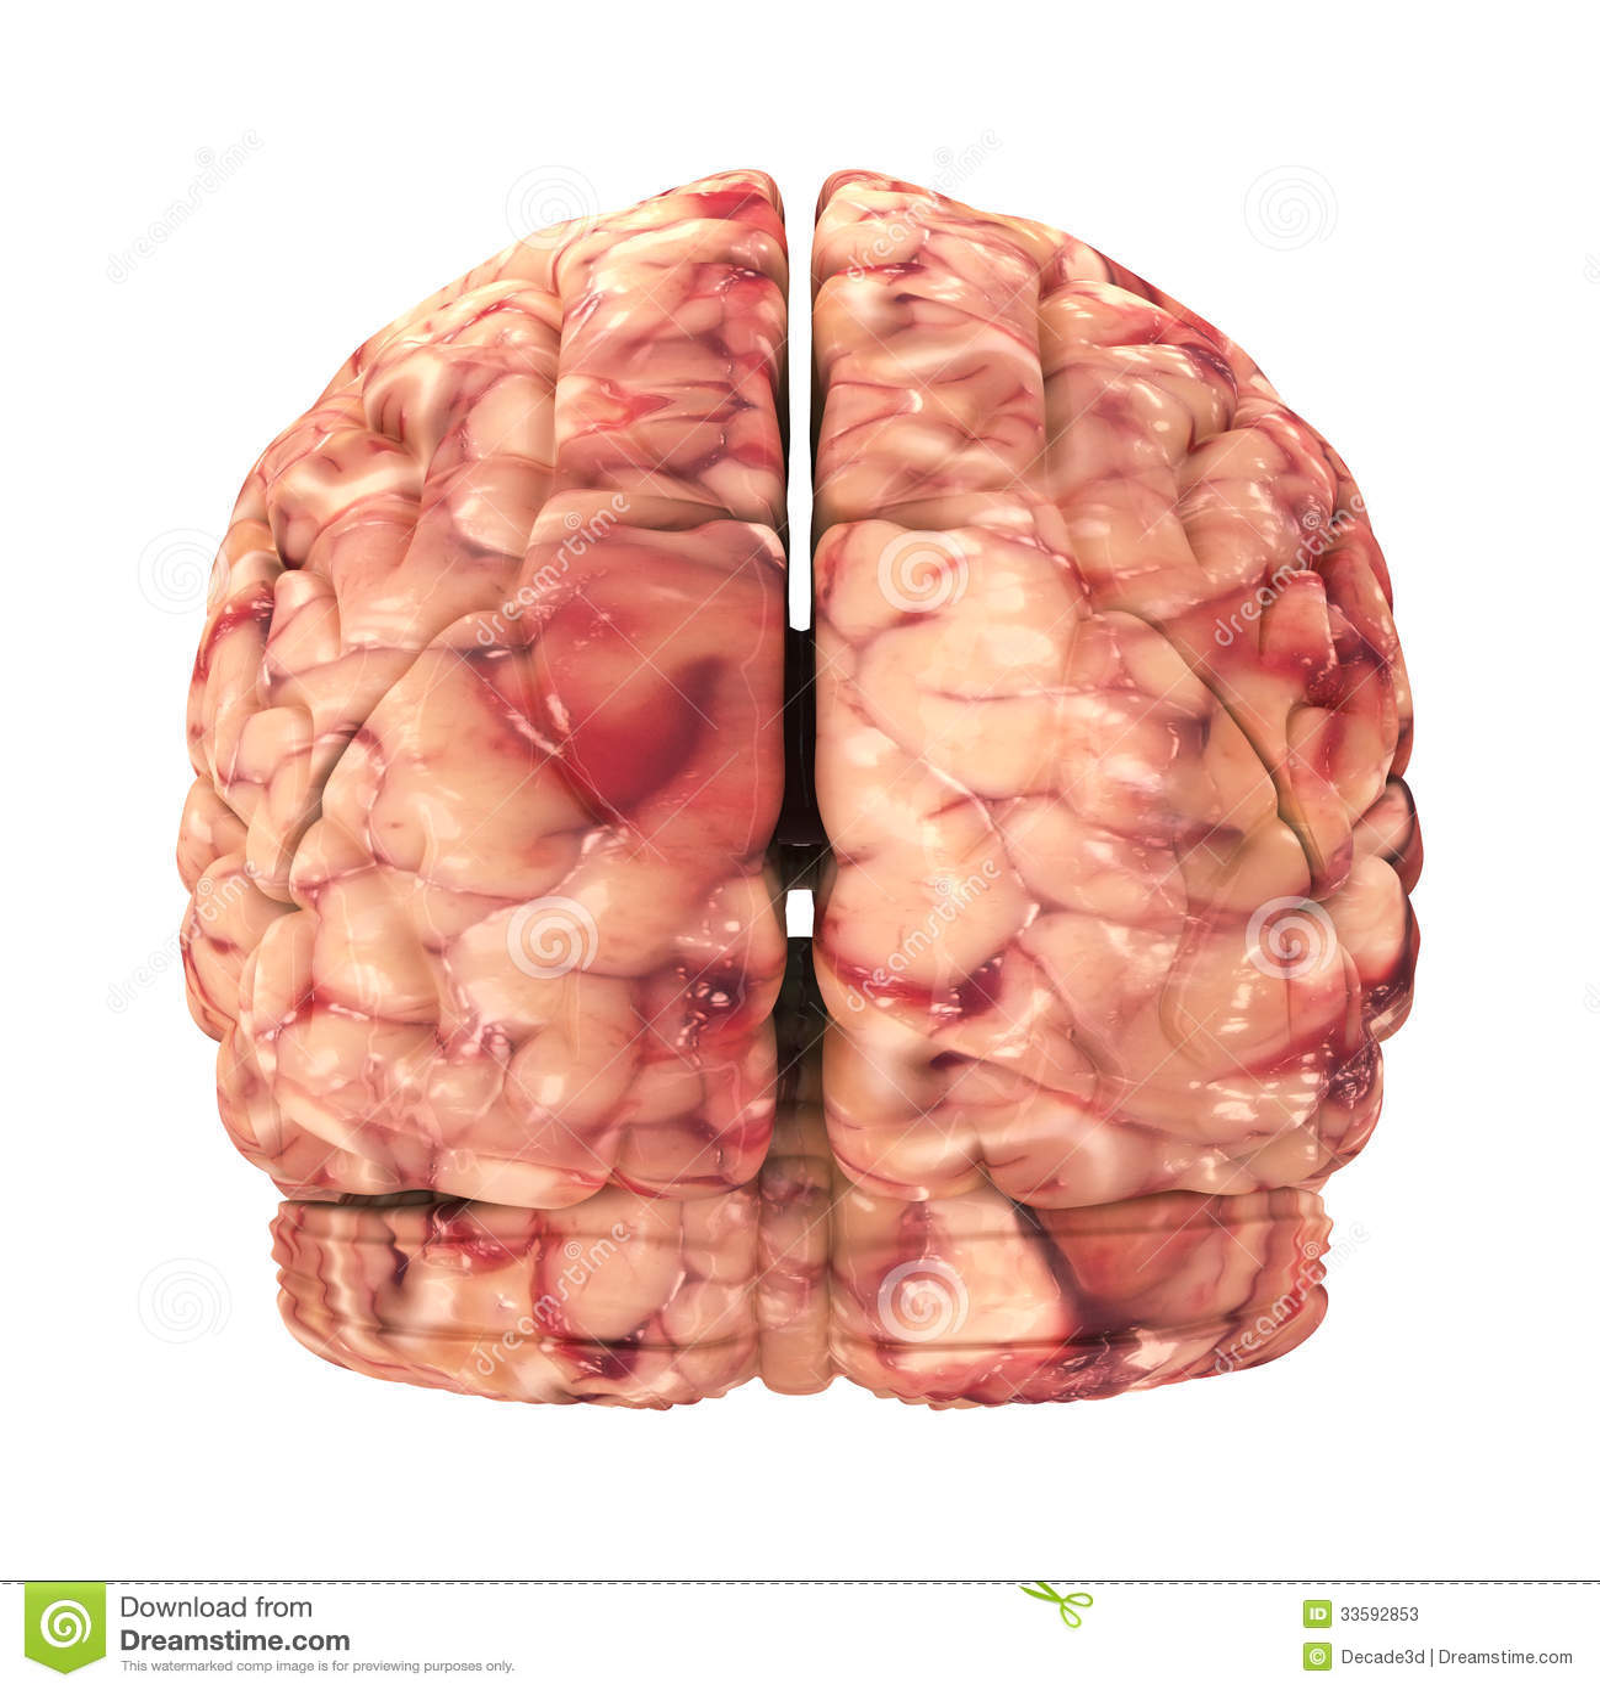 Anatomy Brain Back View Isolated Stock Photos Image